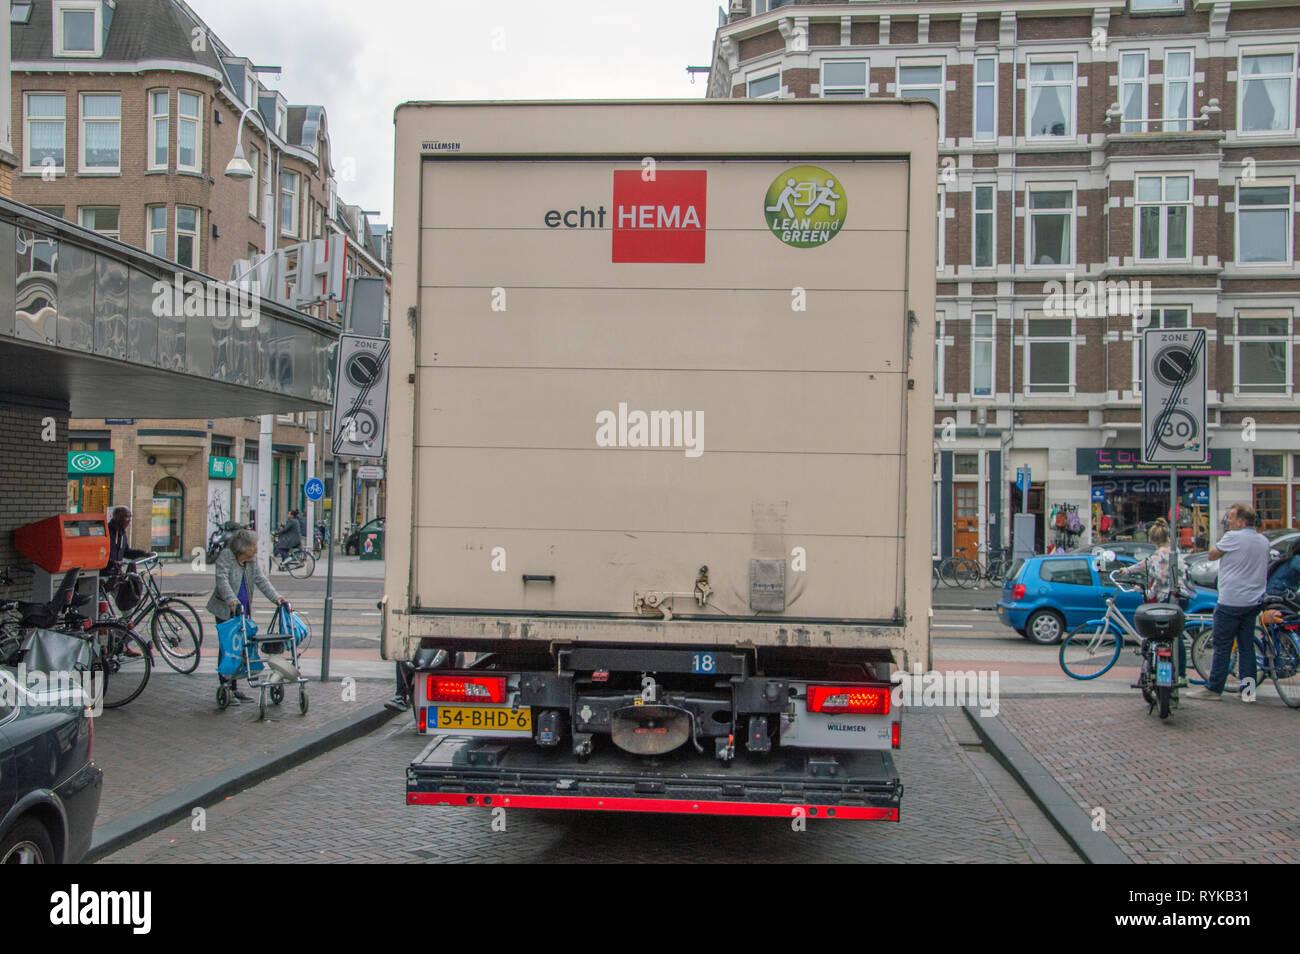 Amsterdam Trademark Stock Photos & Amsterdam Trademark Stock